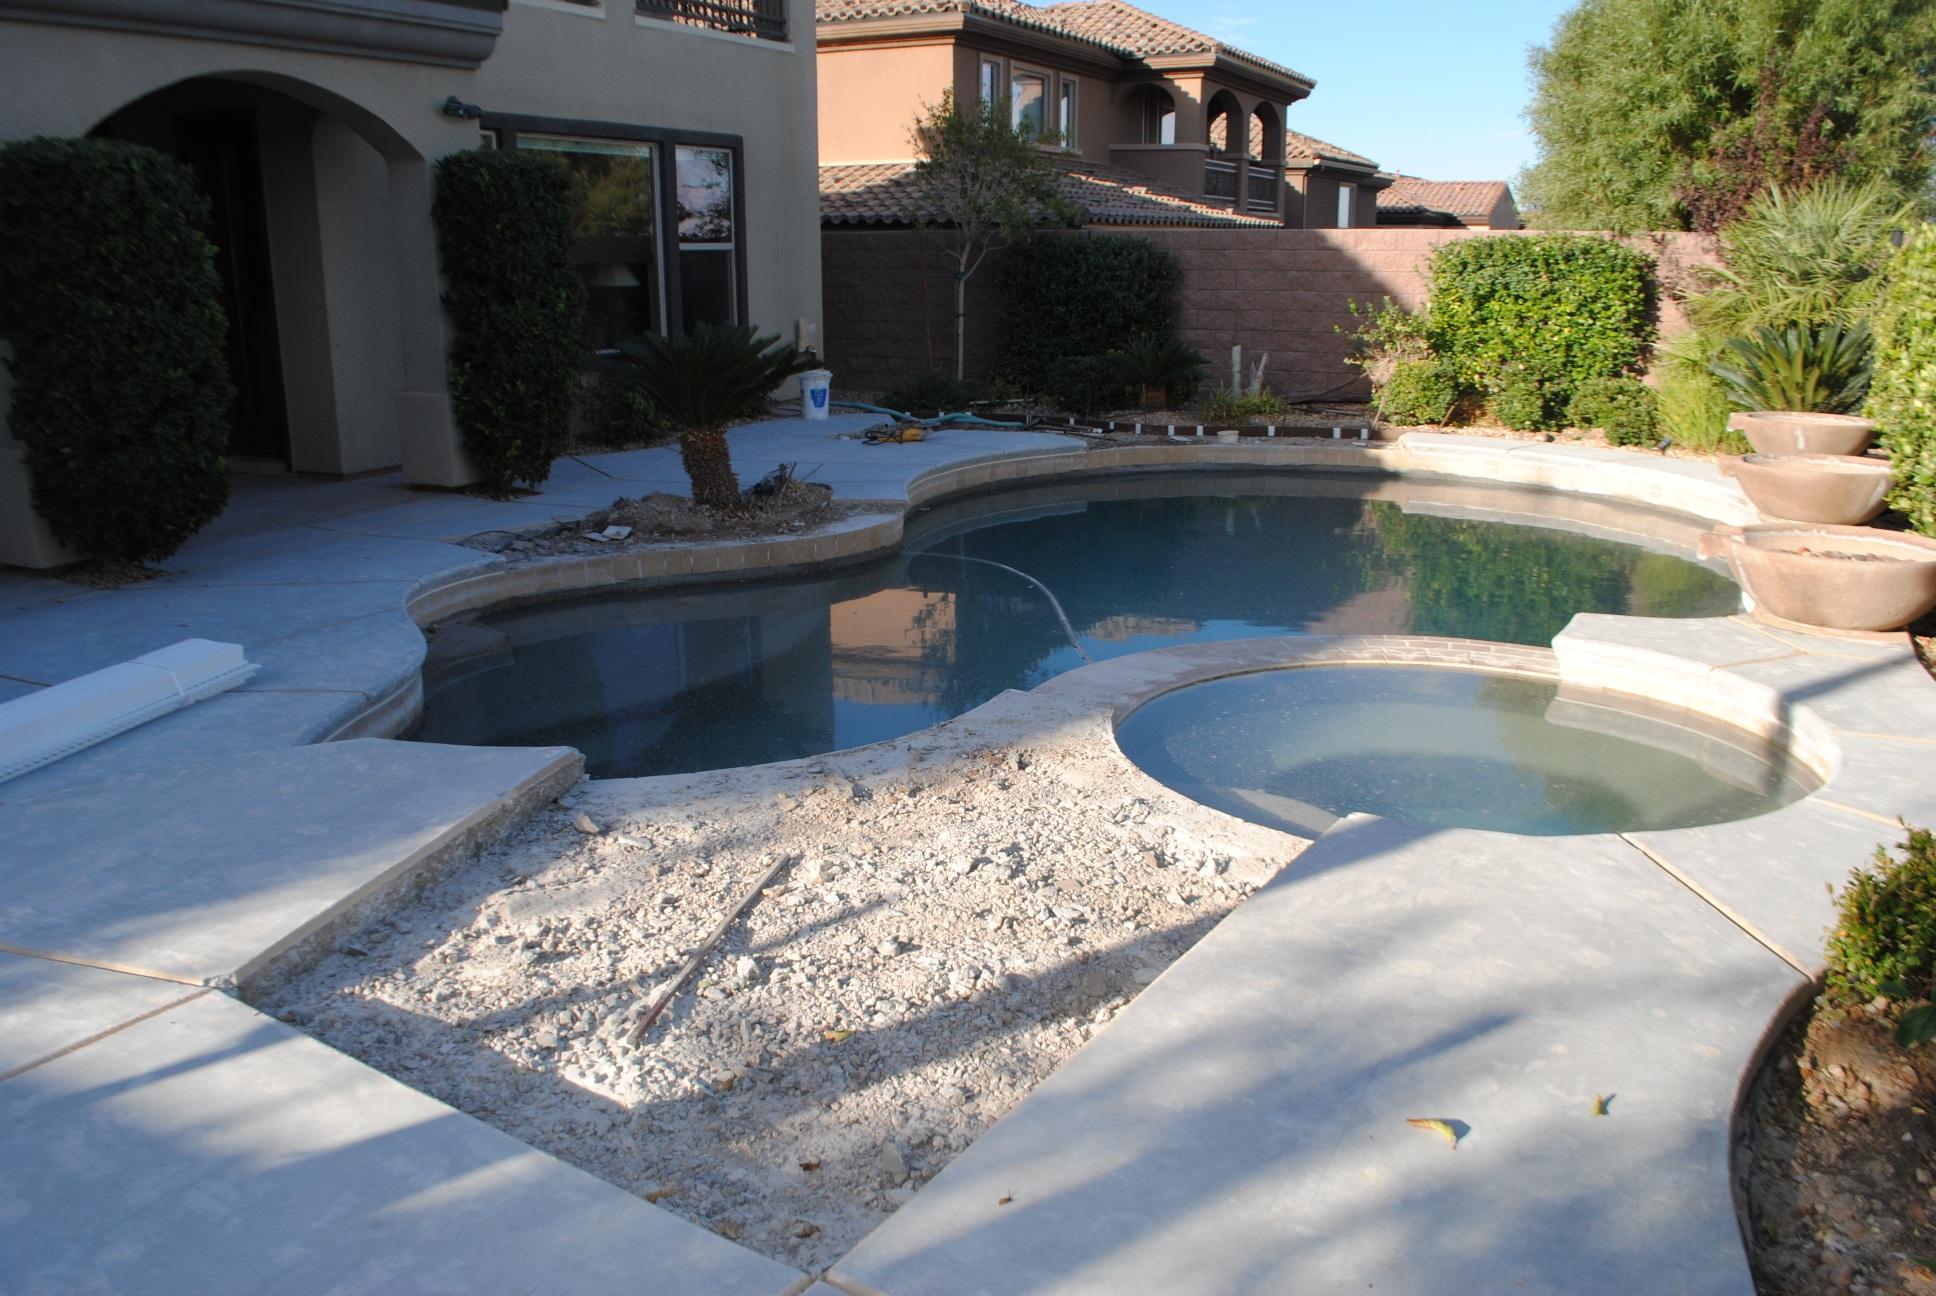 Pool Deck Remodel (during renovation)